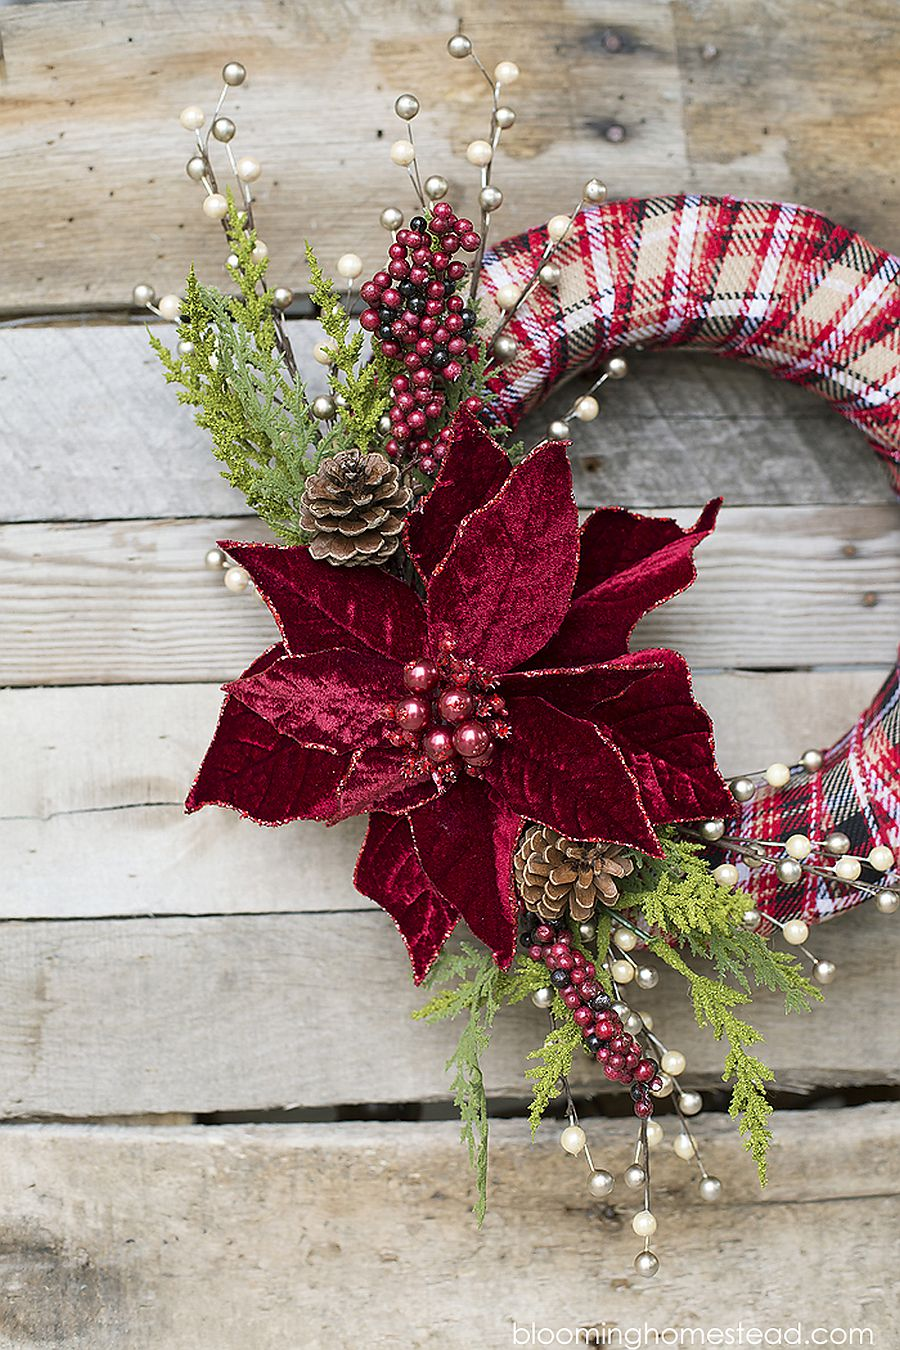 Lovely use of color creates a stunning DIY Christmas wreath